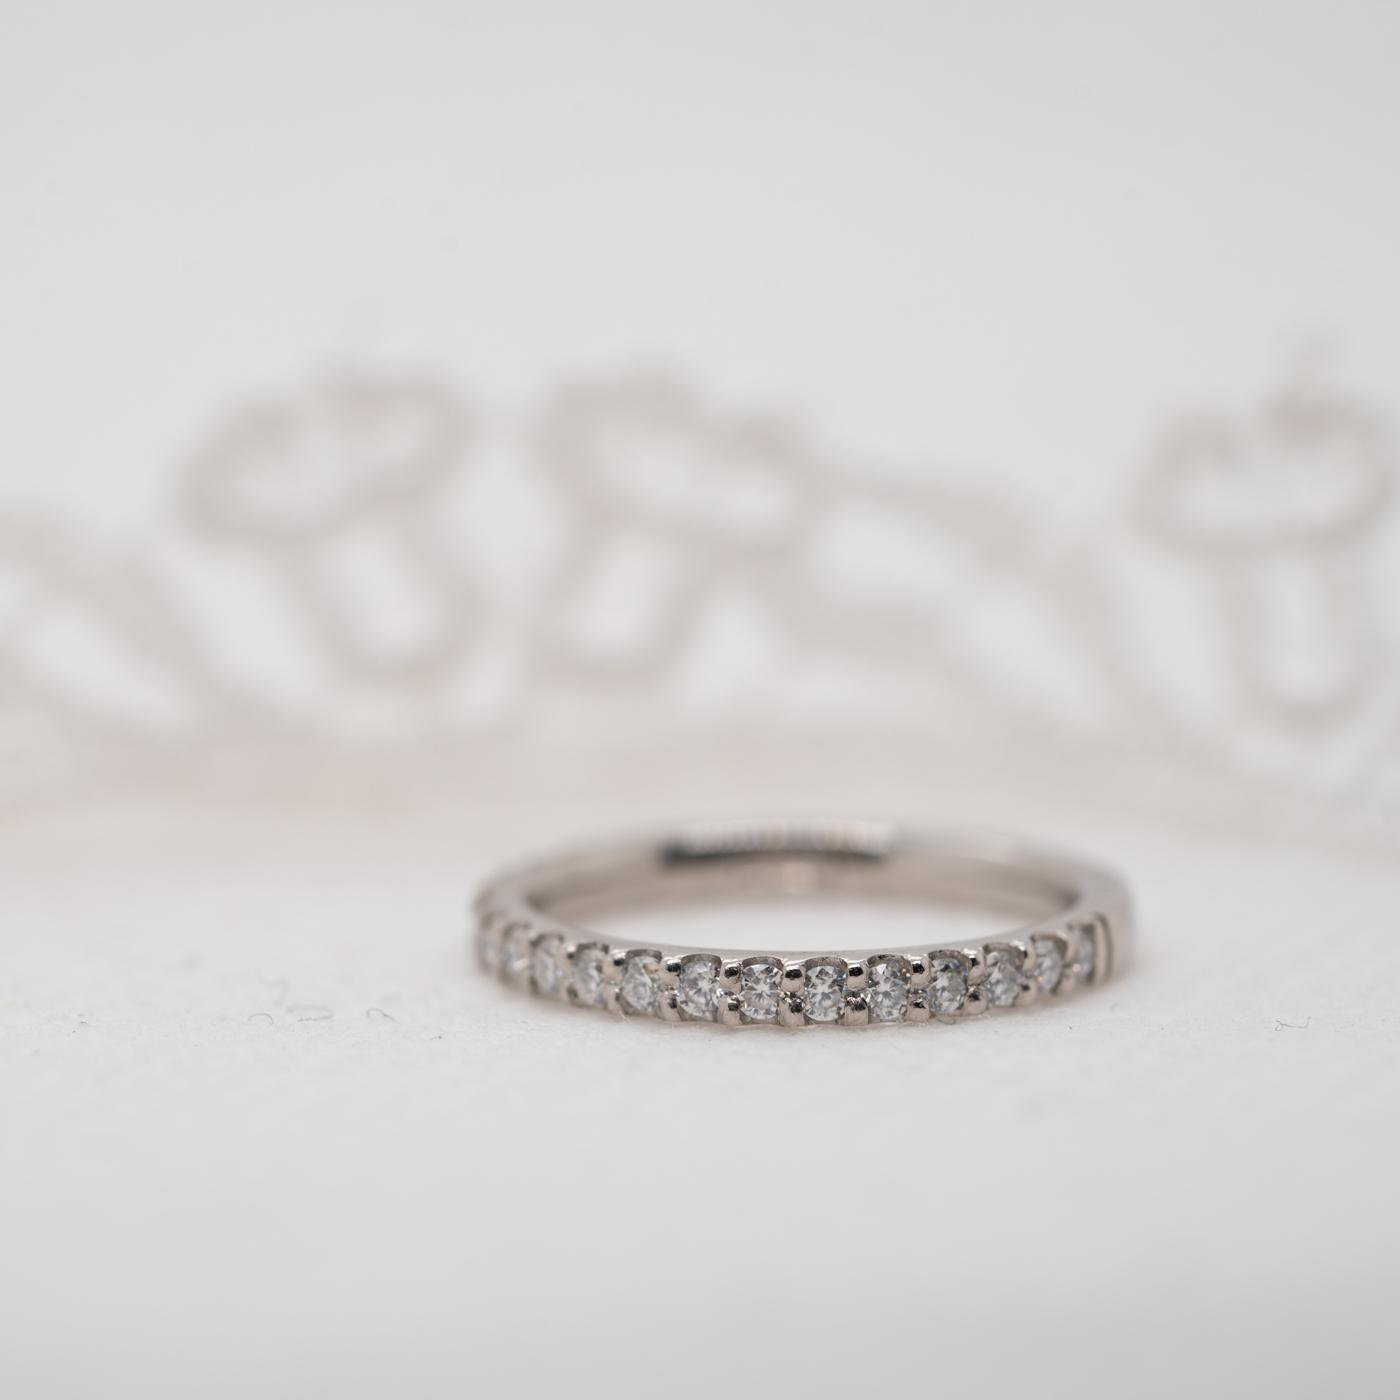 Vegan Friendly Diamond Ring | Eloise | Ethica Diamonds Cornwall UK